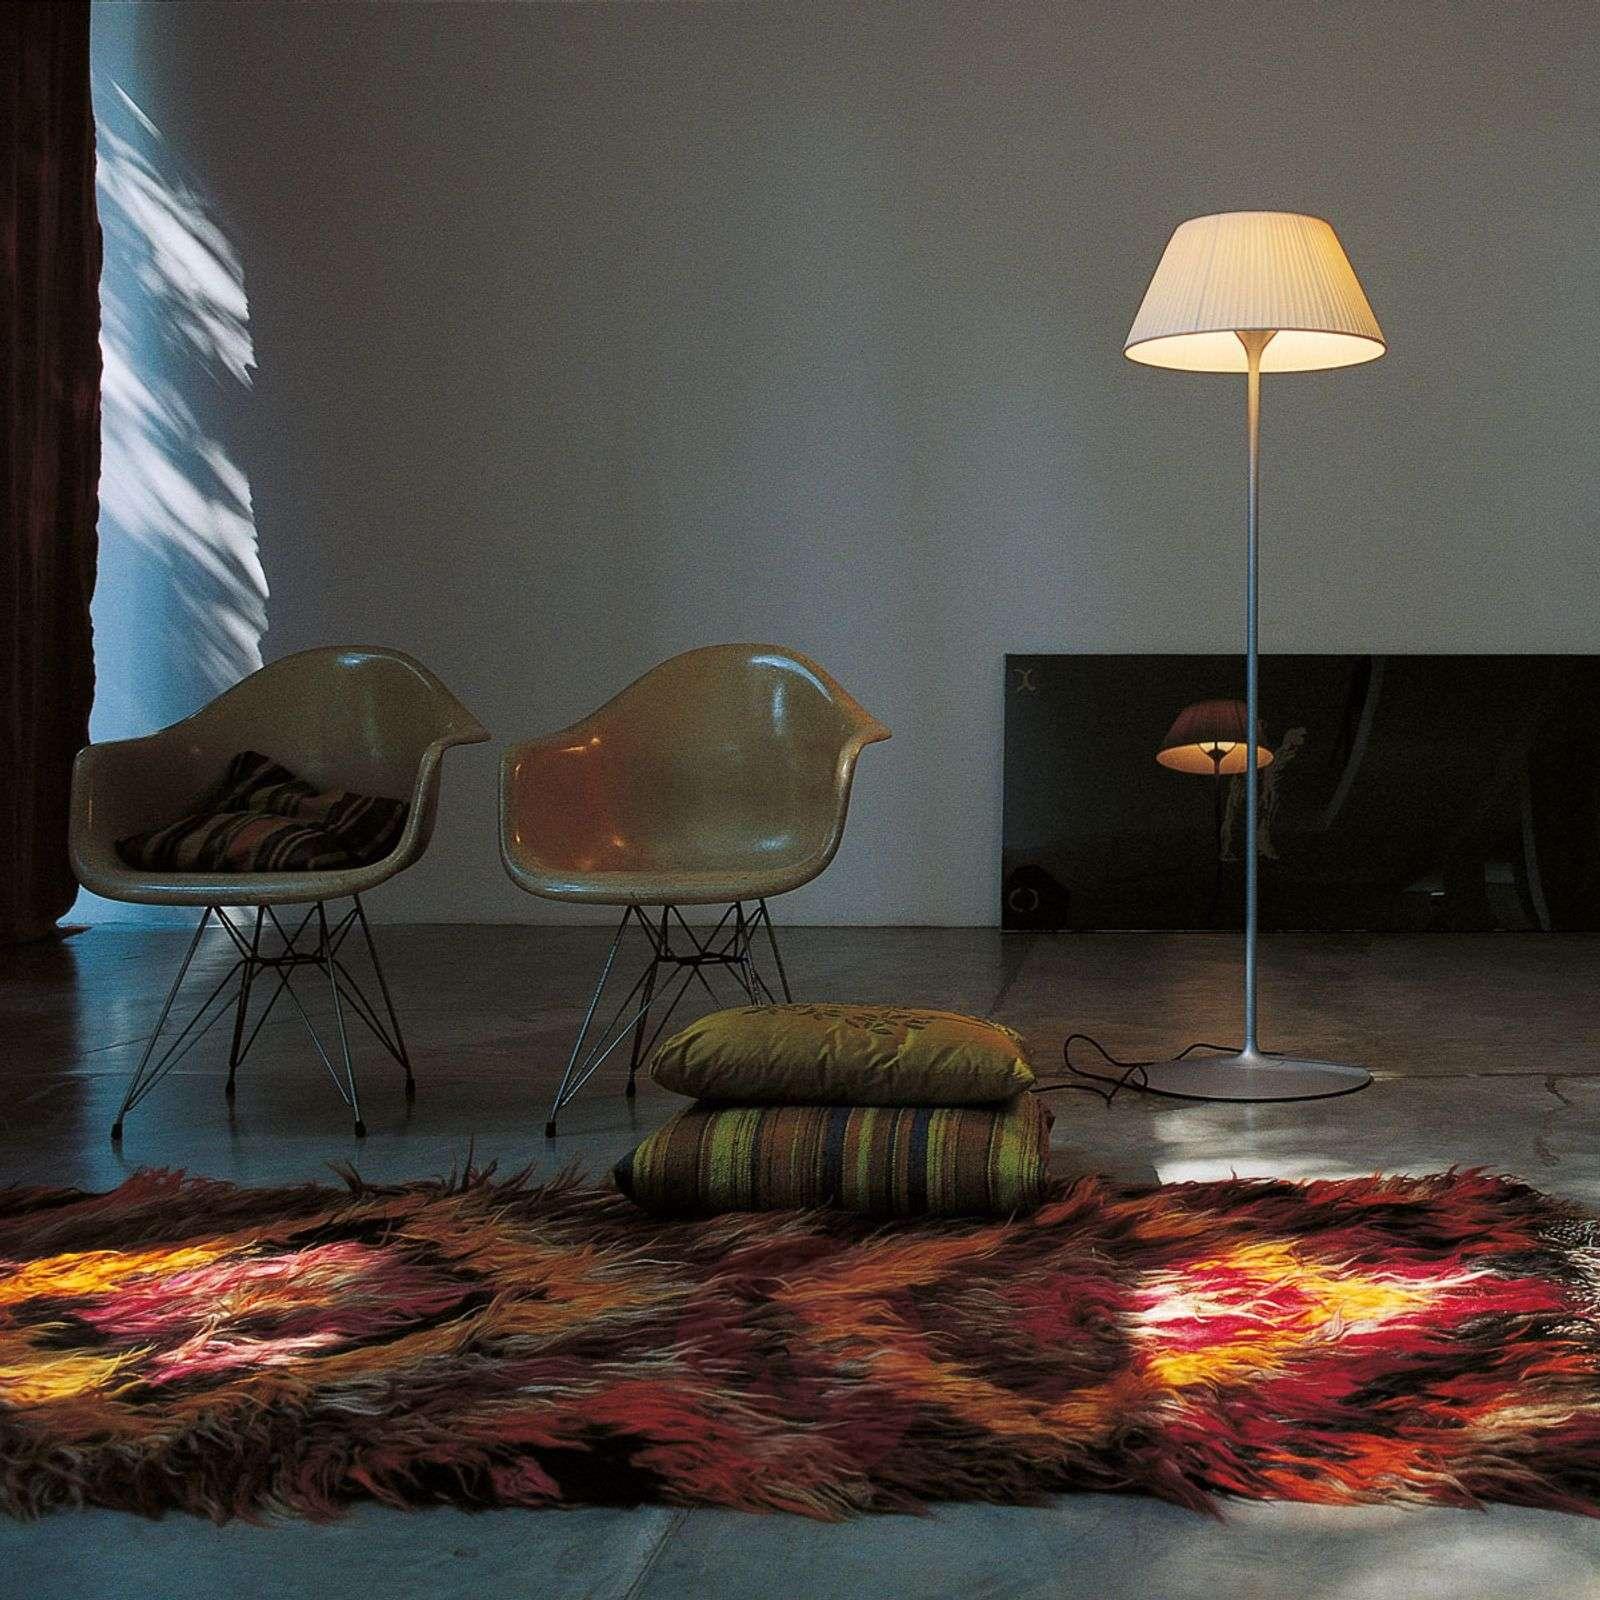 Romeo Soft F Floor Lamp Cosy Beam of Light-3510150-03